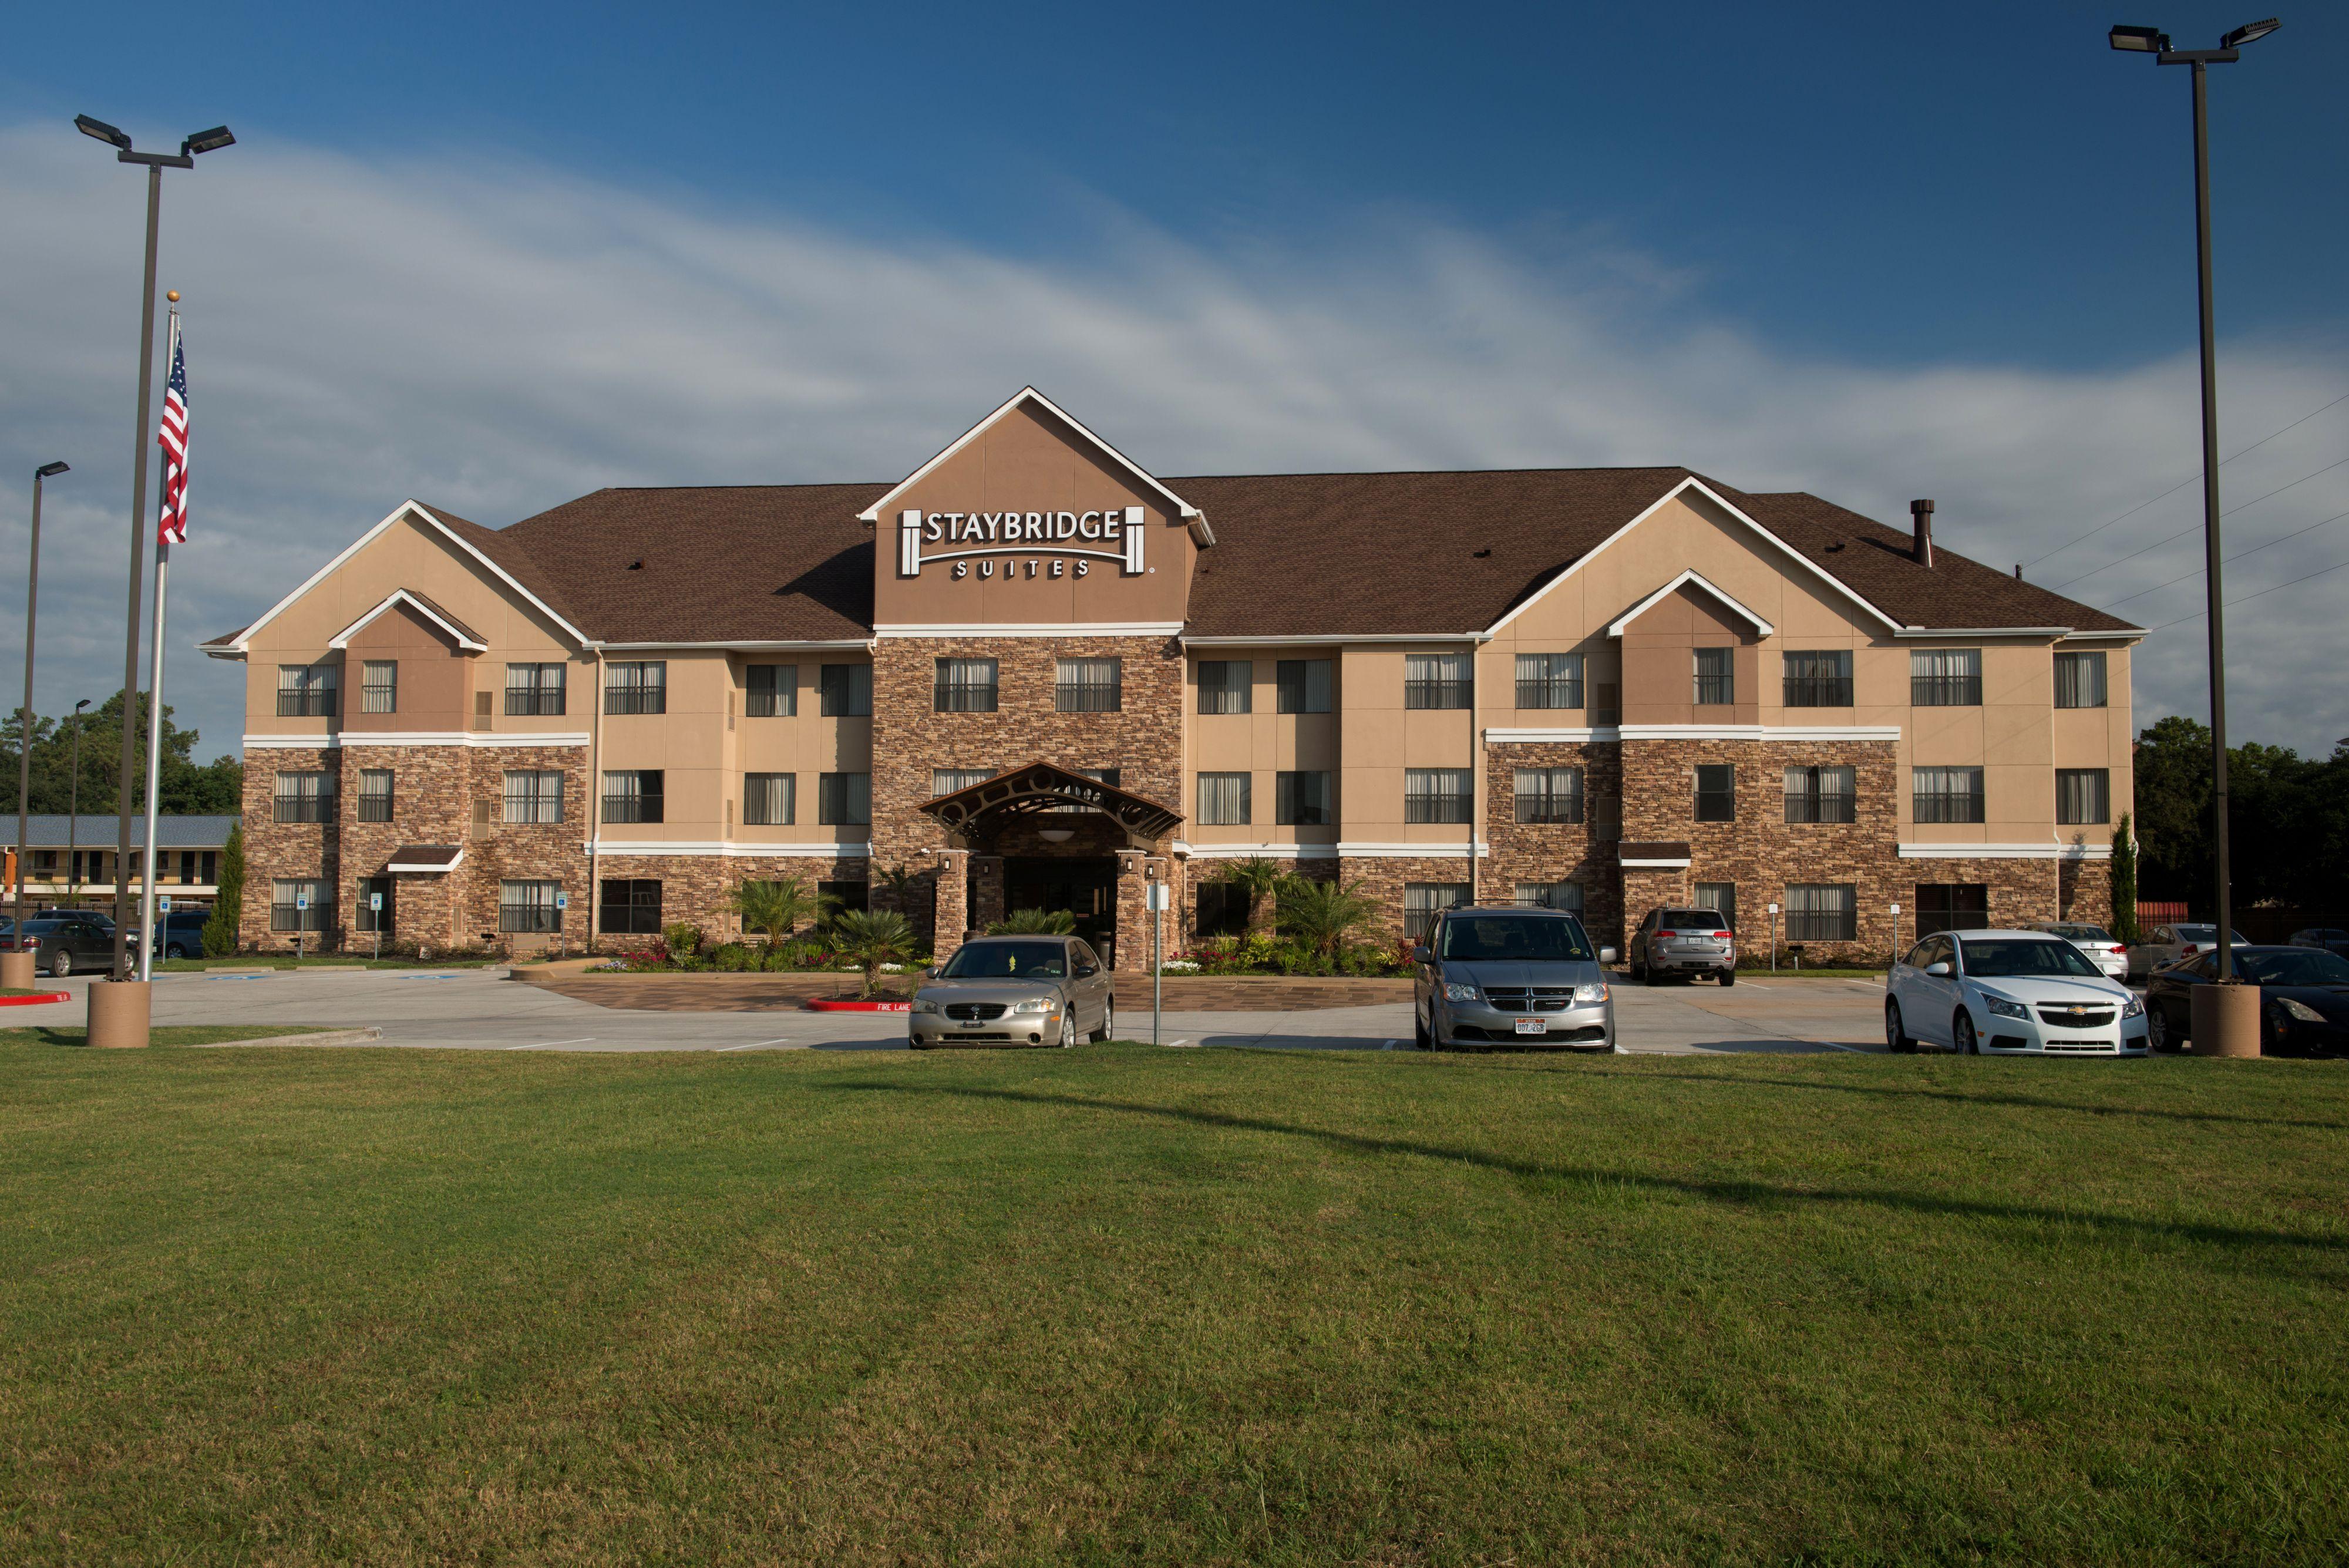 Staybridge suites houston willowbrook hwy 249 houston - Hilton garden inn houston nw willowbrook ...